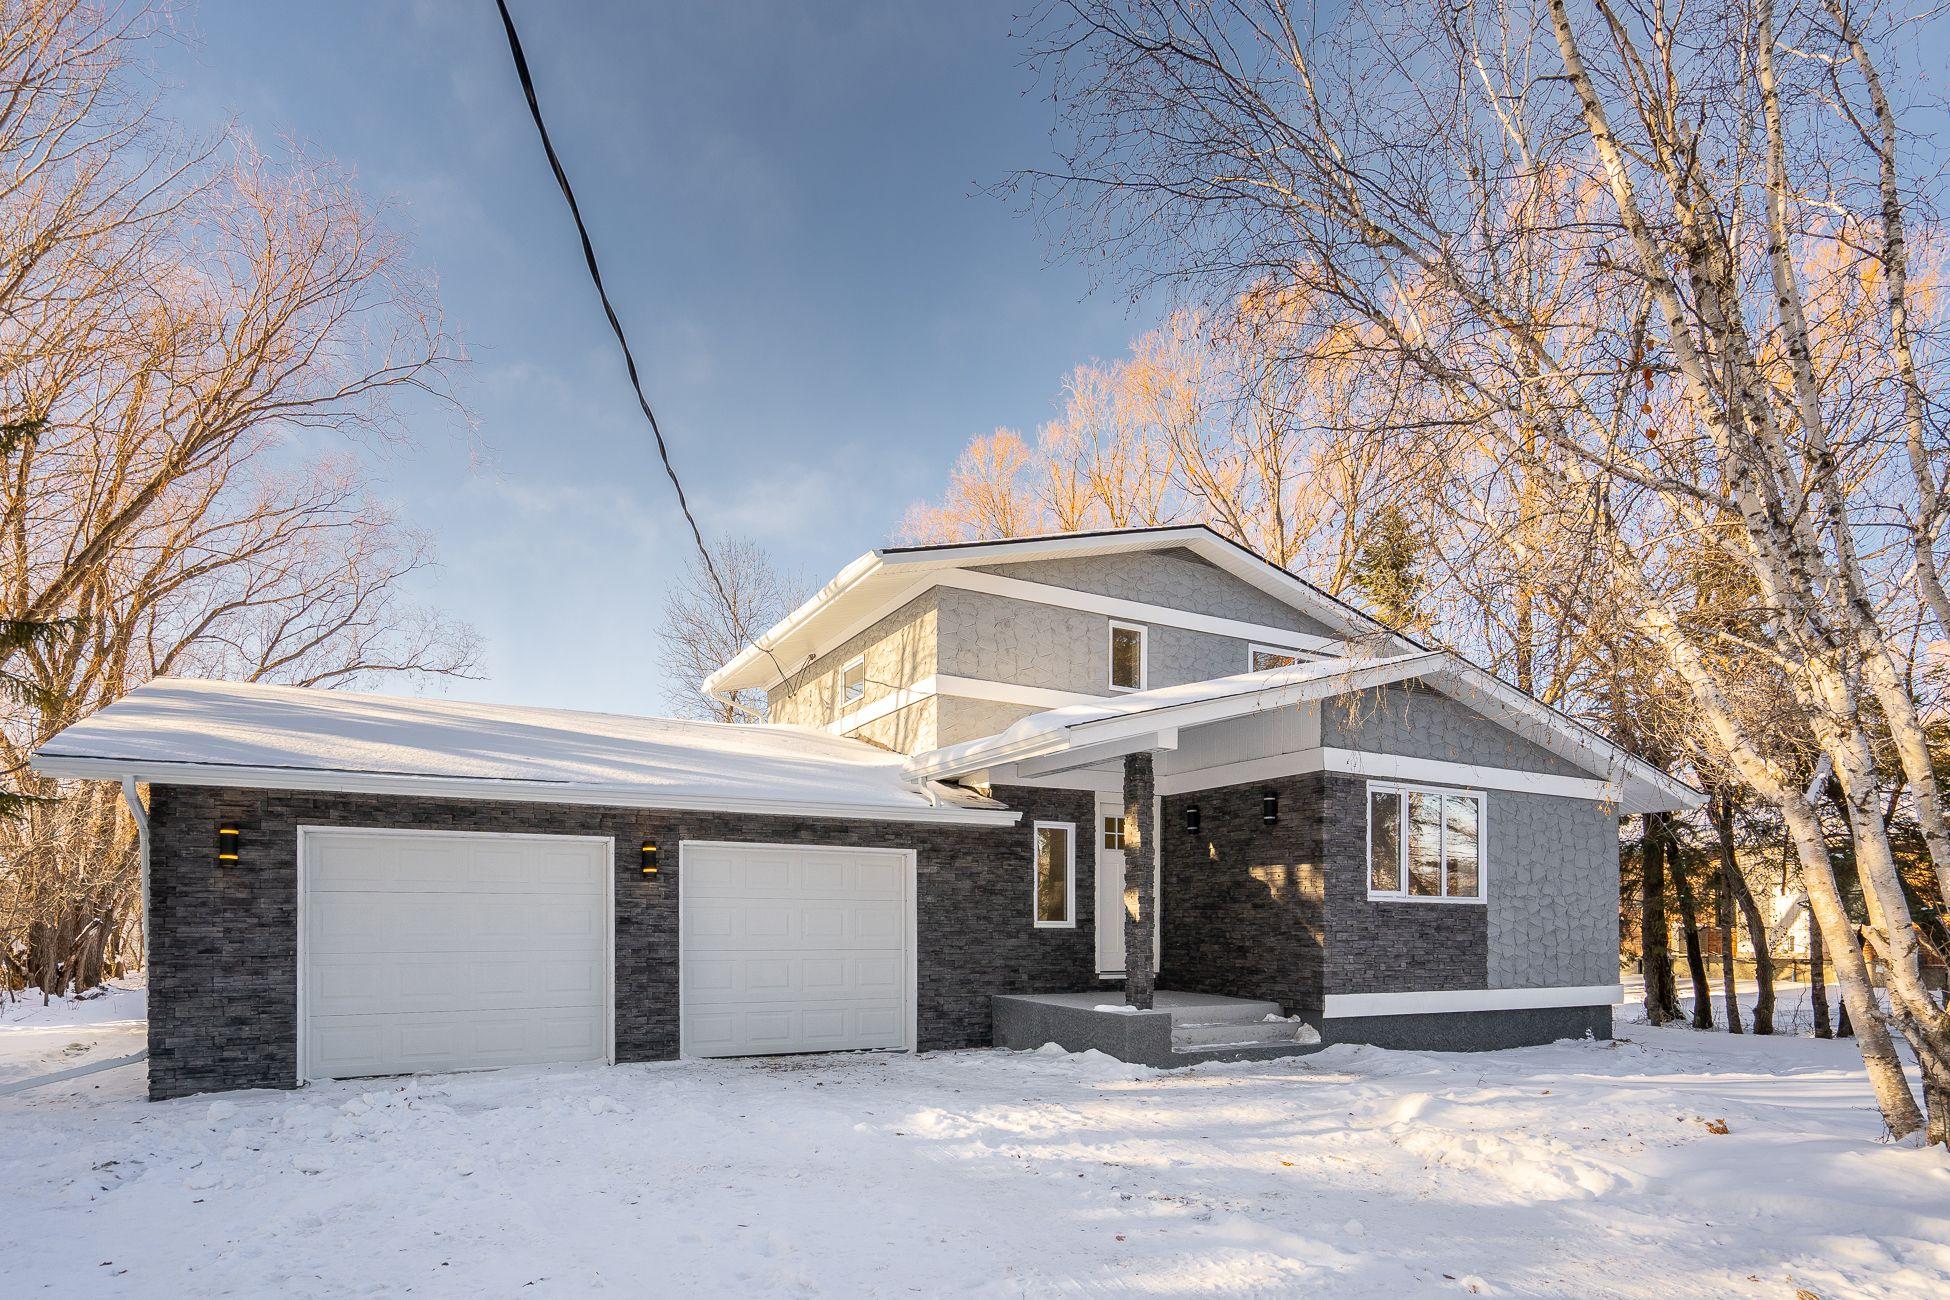 Main Photo: 1436 Liberty Street in Winnipeg: Charleswood House for sale (1N)  : MLS®# 202029729